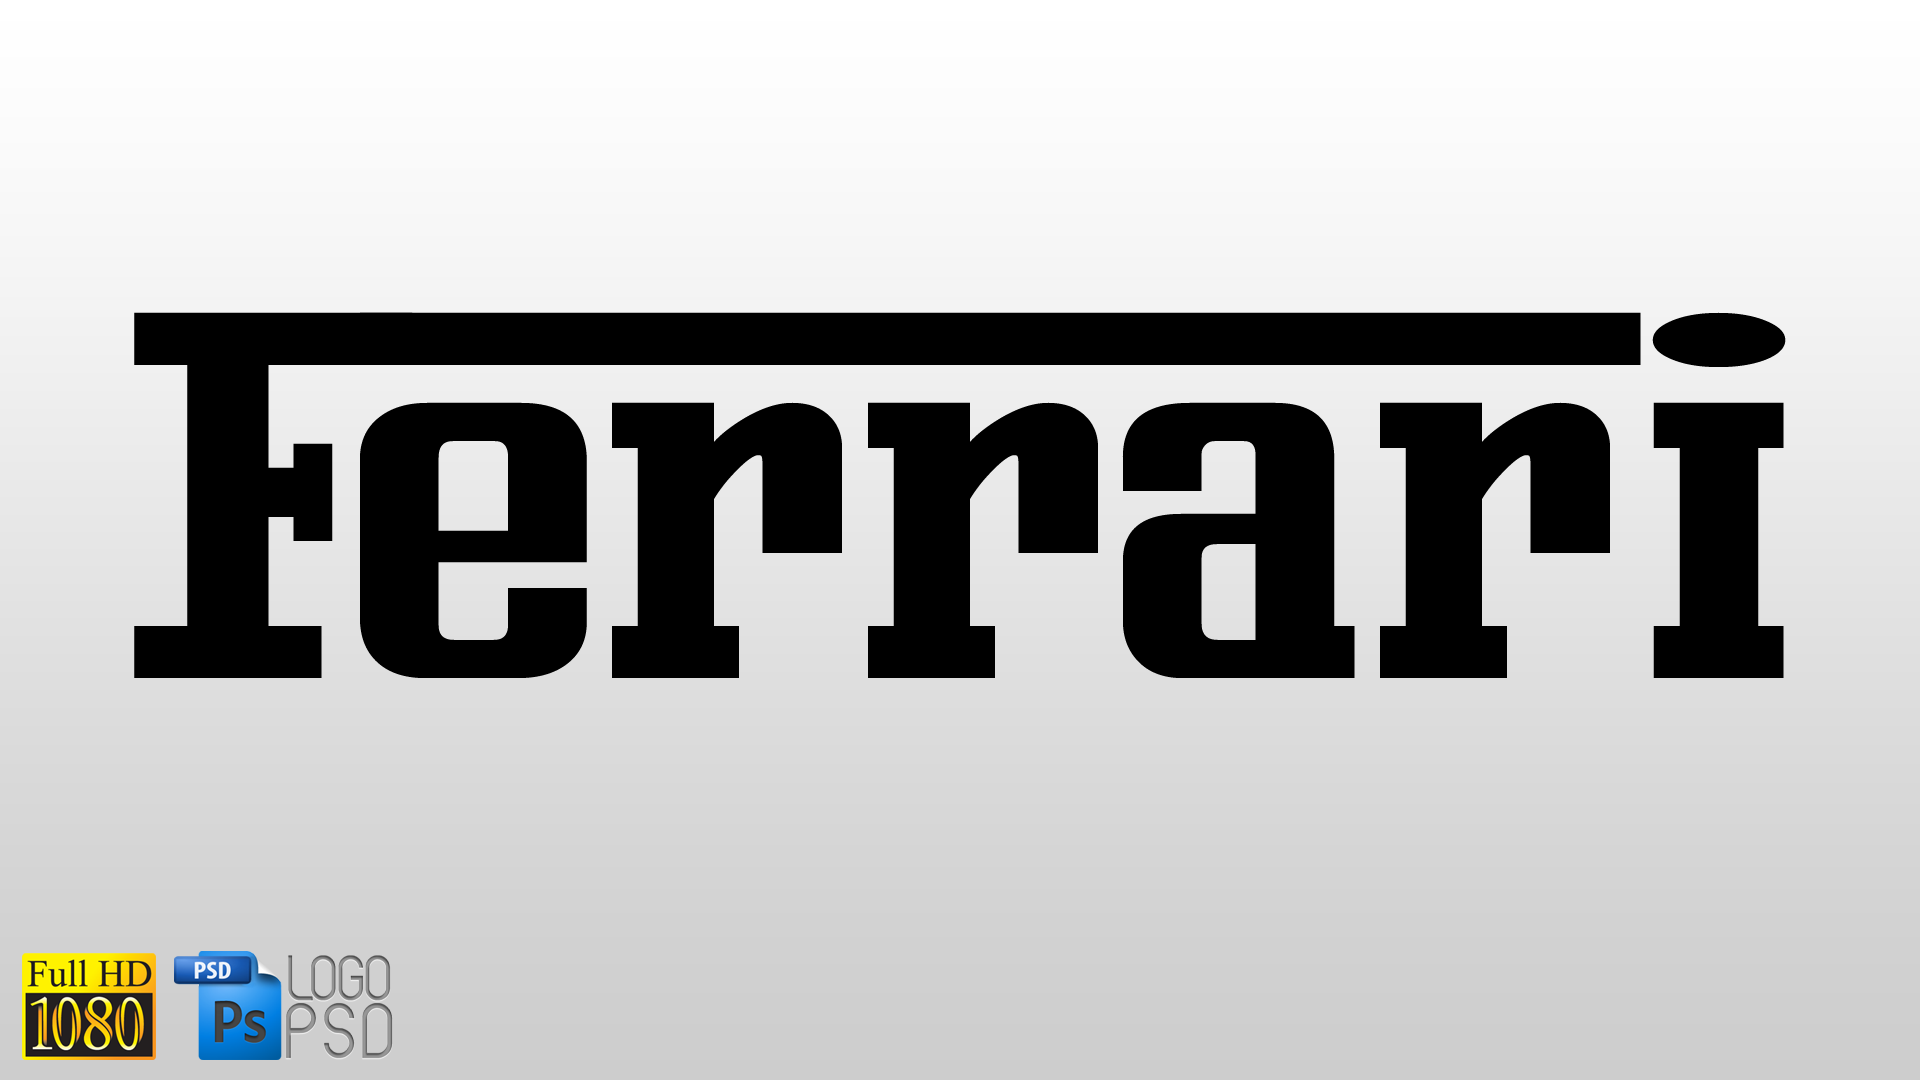 Ferrari Logo Google Search Logo Psd Ferrari Ferrari Car Wallpapers